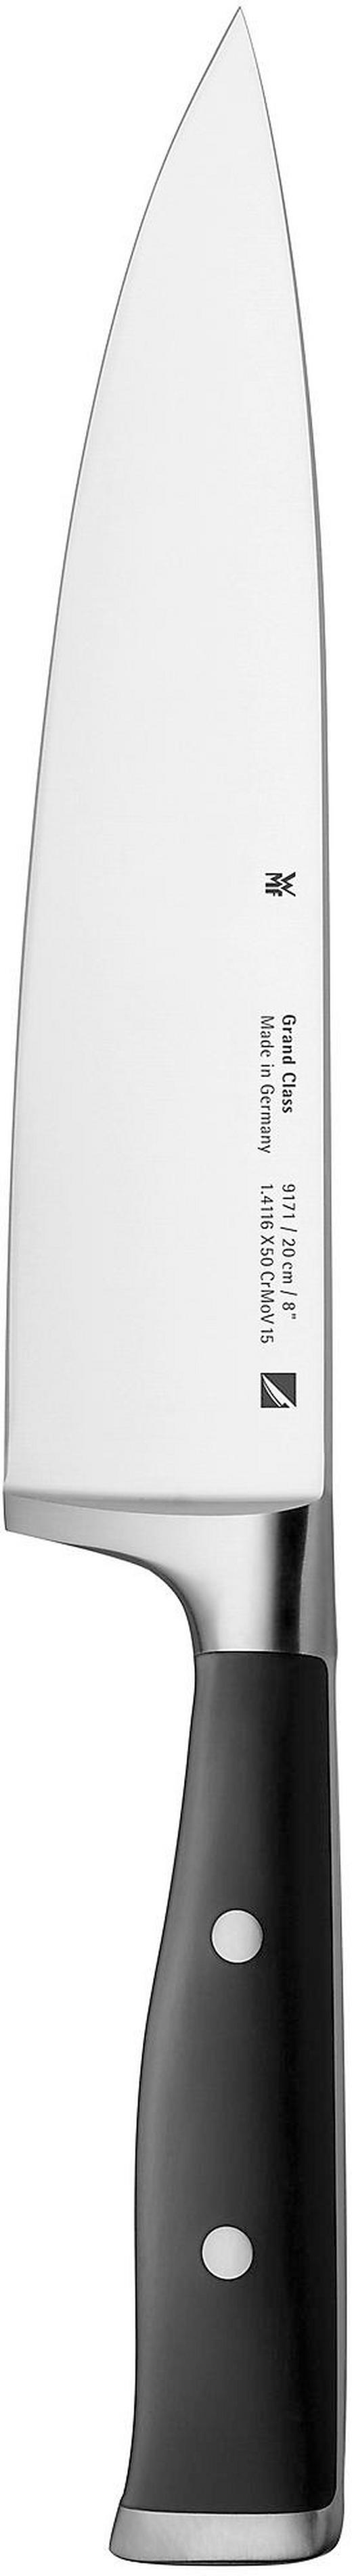 KOCHMESSER  Stahl  35 cm - Edelstahlfarben/Schwarz, Basics, Kunststoff/Metall (35cm) - WMF